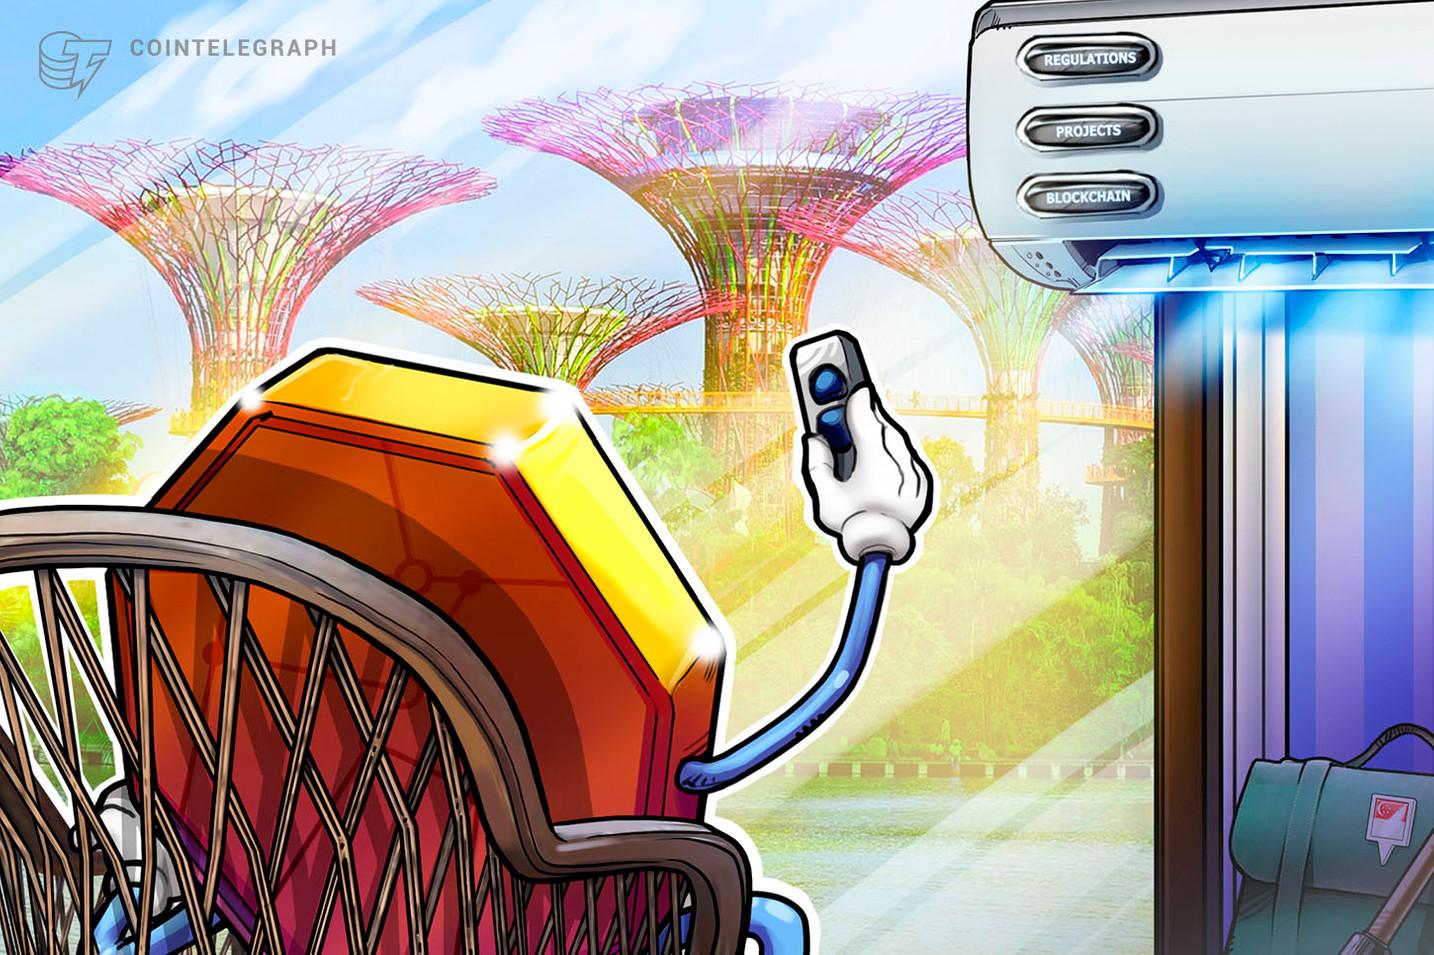 Predlog smanjenja poreza na kriptovalute u Singapuru kako bi se podstaklo kripto poslovanje